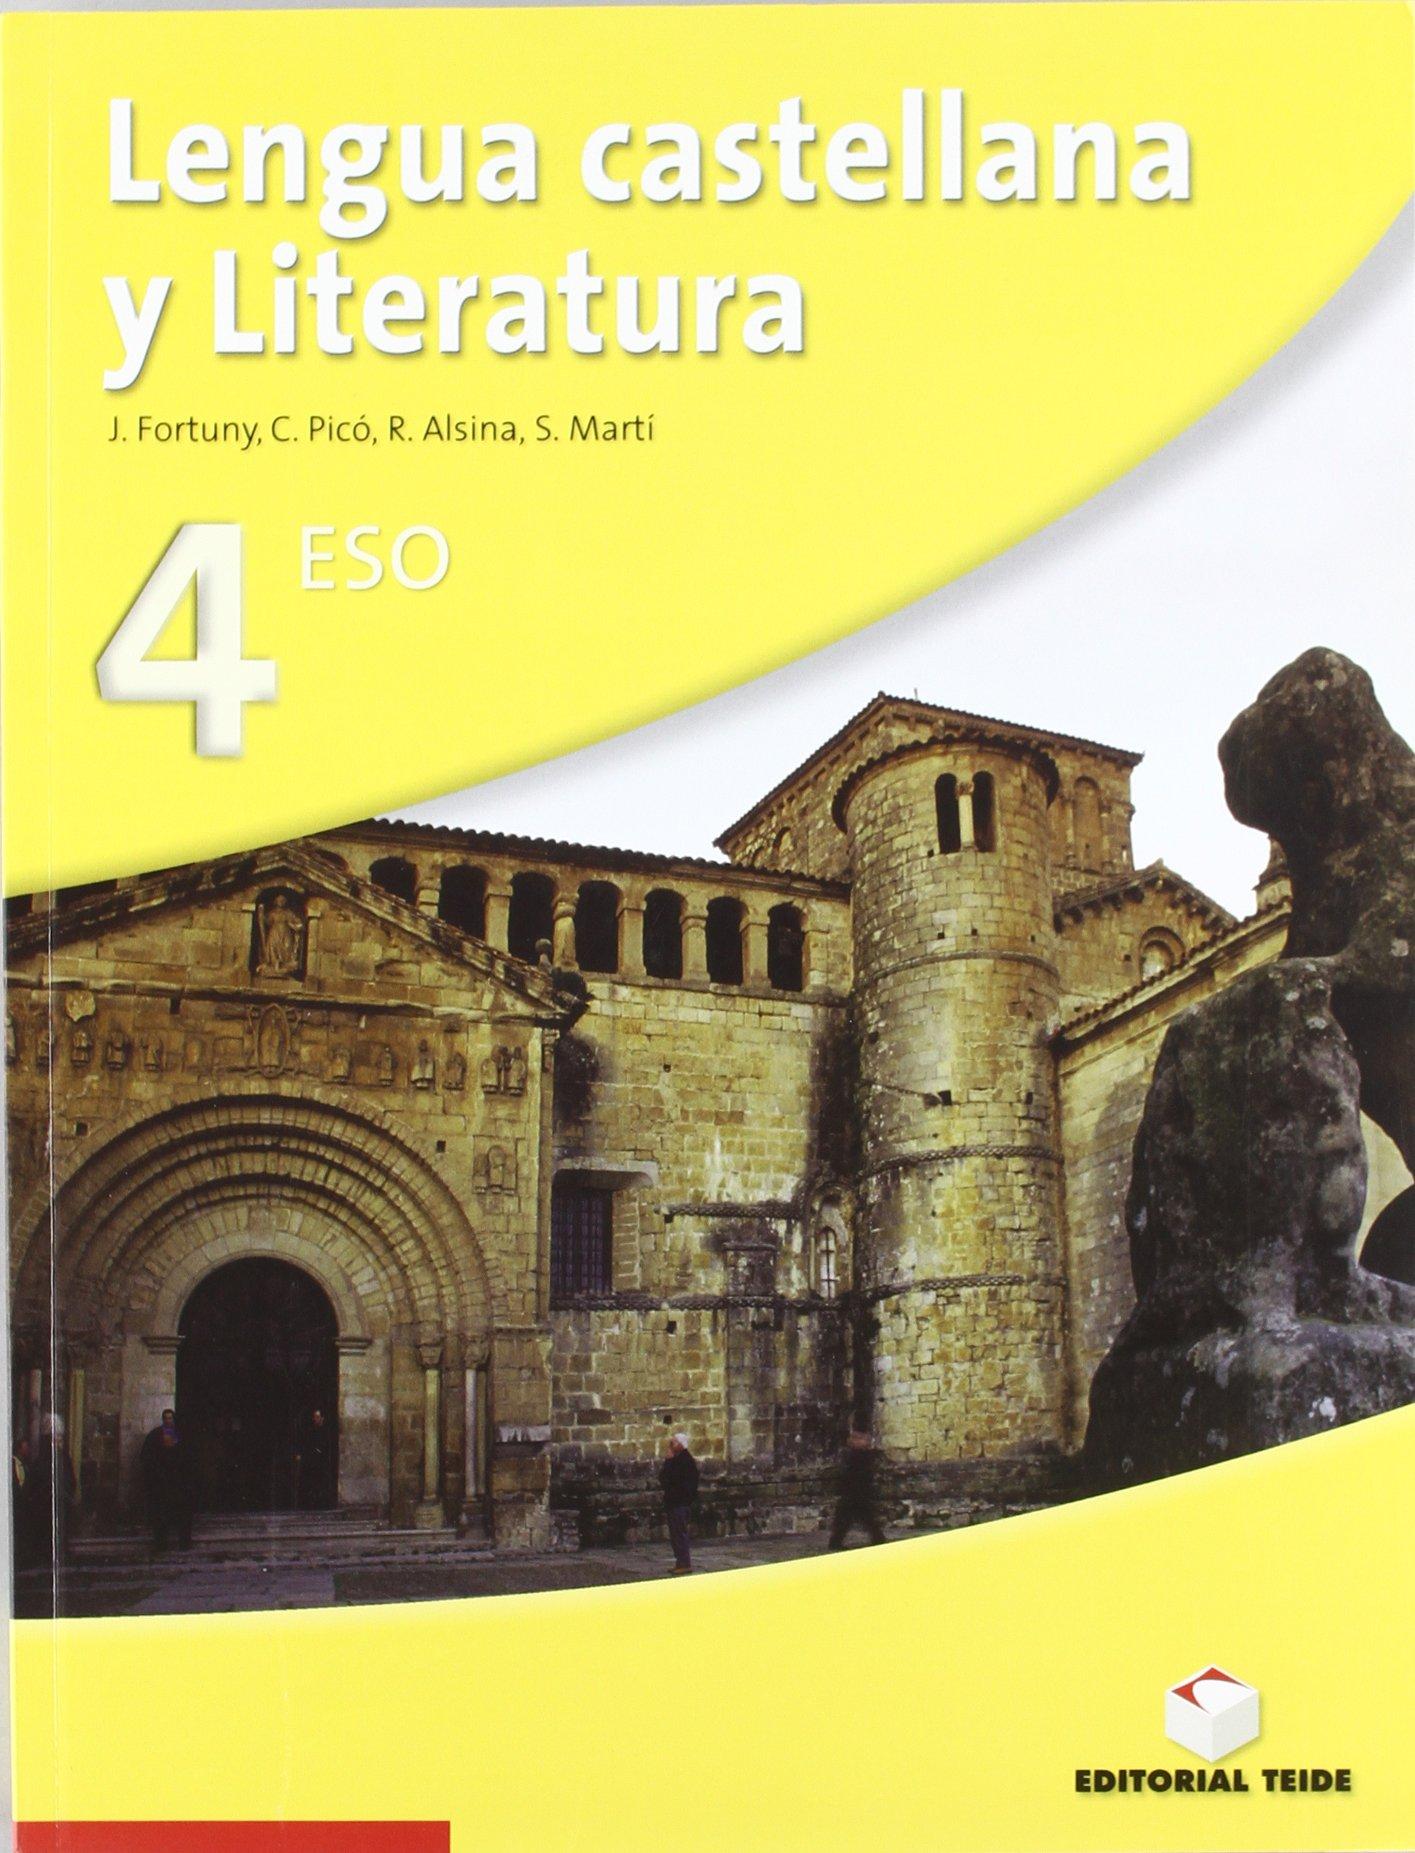 Lengua castellana y literatura 4, ESO - 9788430786534: Amazon.es: Fortuny Giné, Joan Baptista, Picó Llorca, Carme, Alsina Soriano, Rosa, Martí Raüll, Salvador: Libros